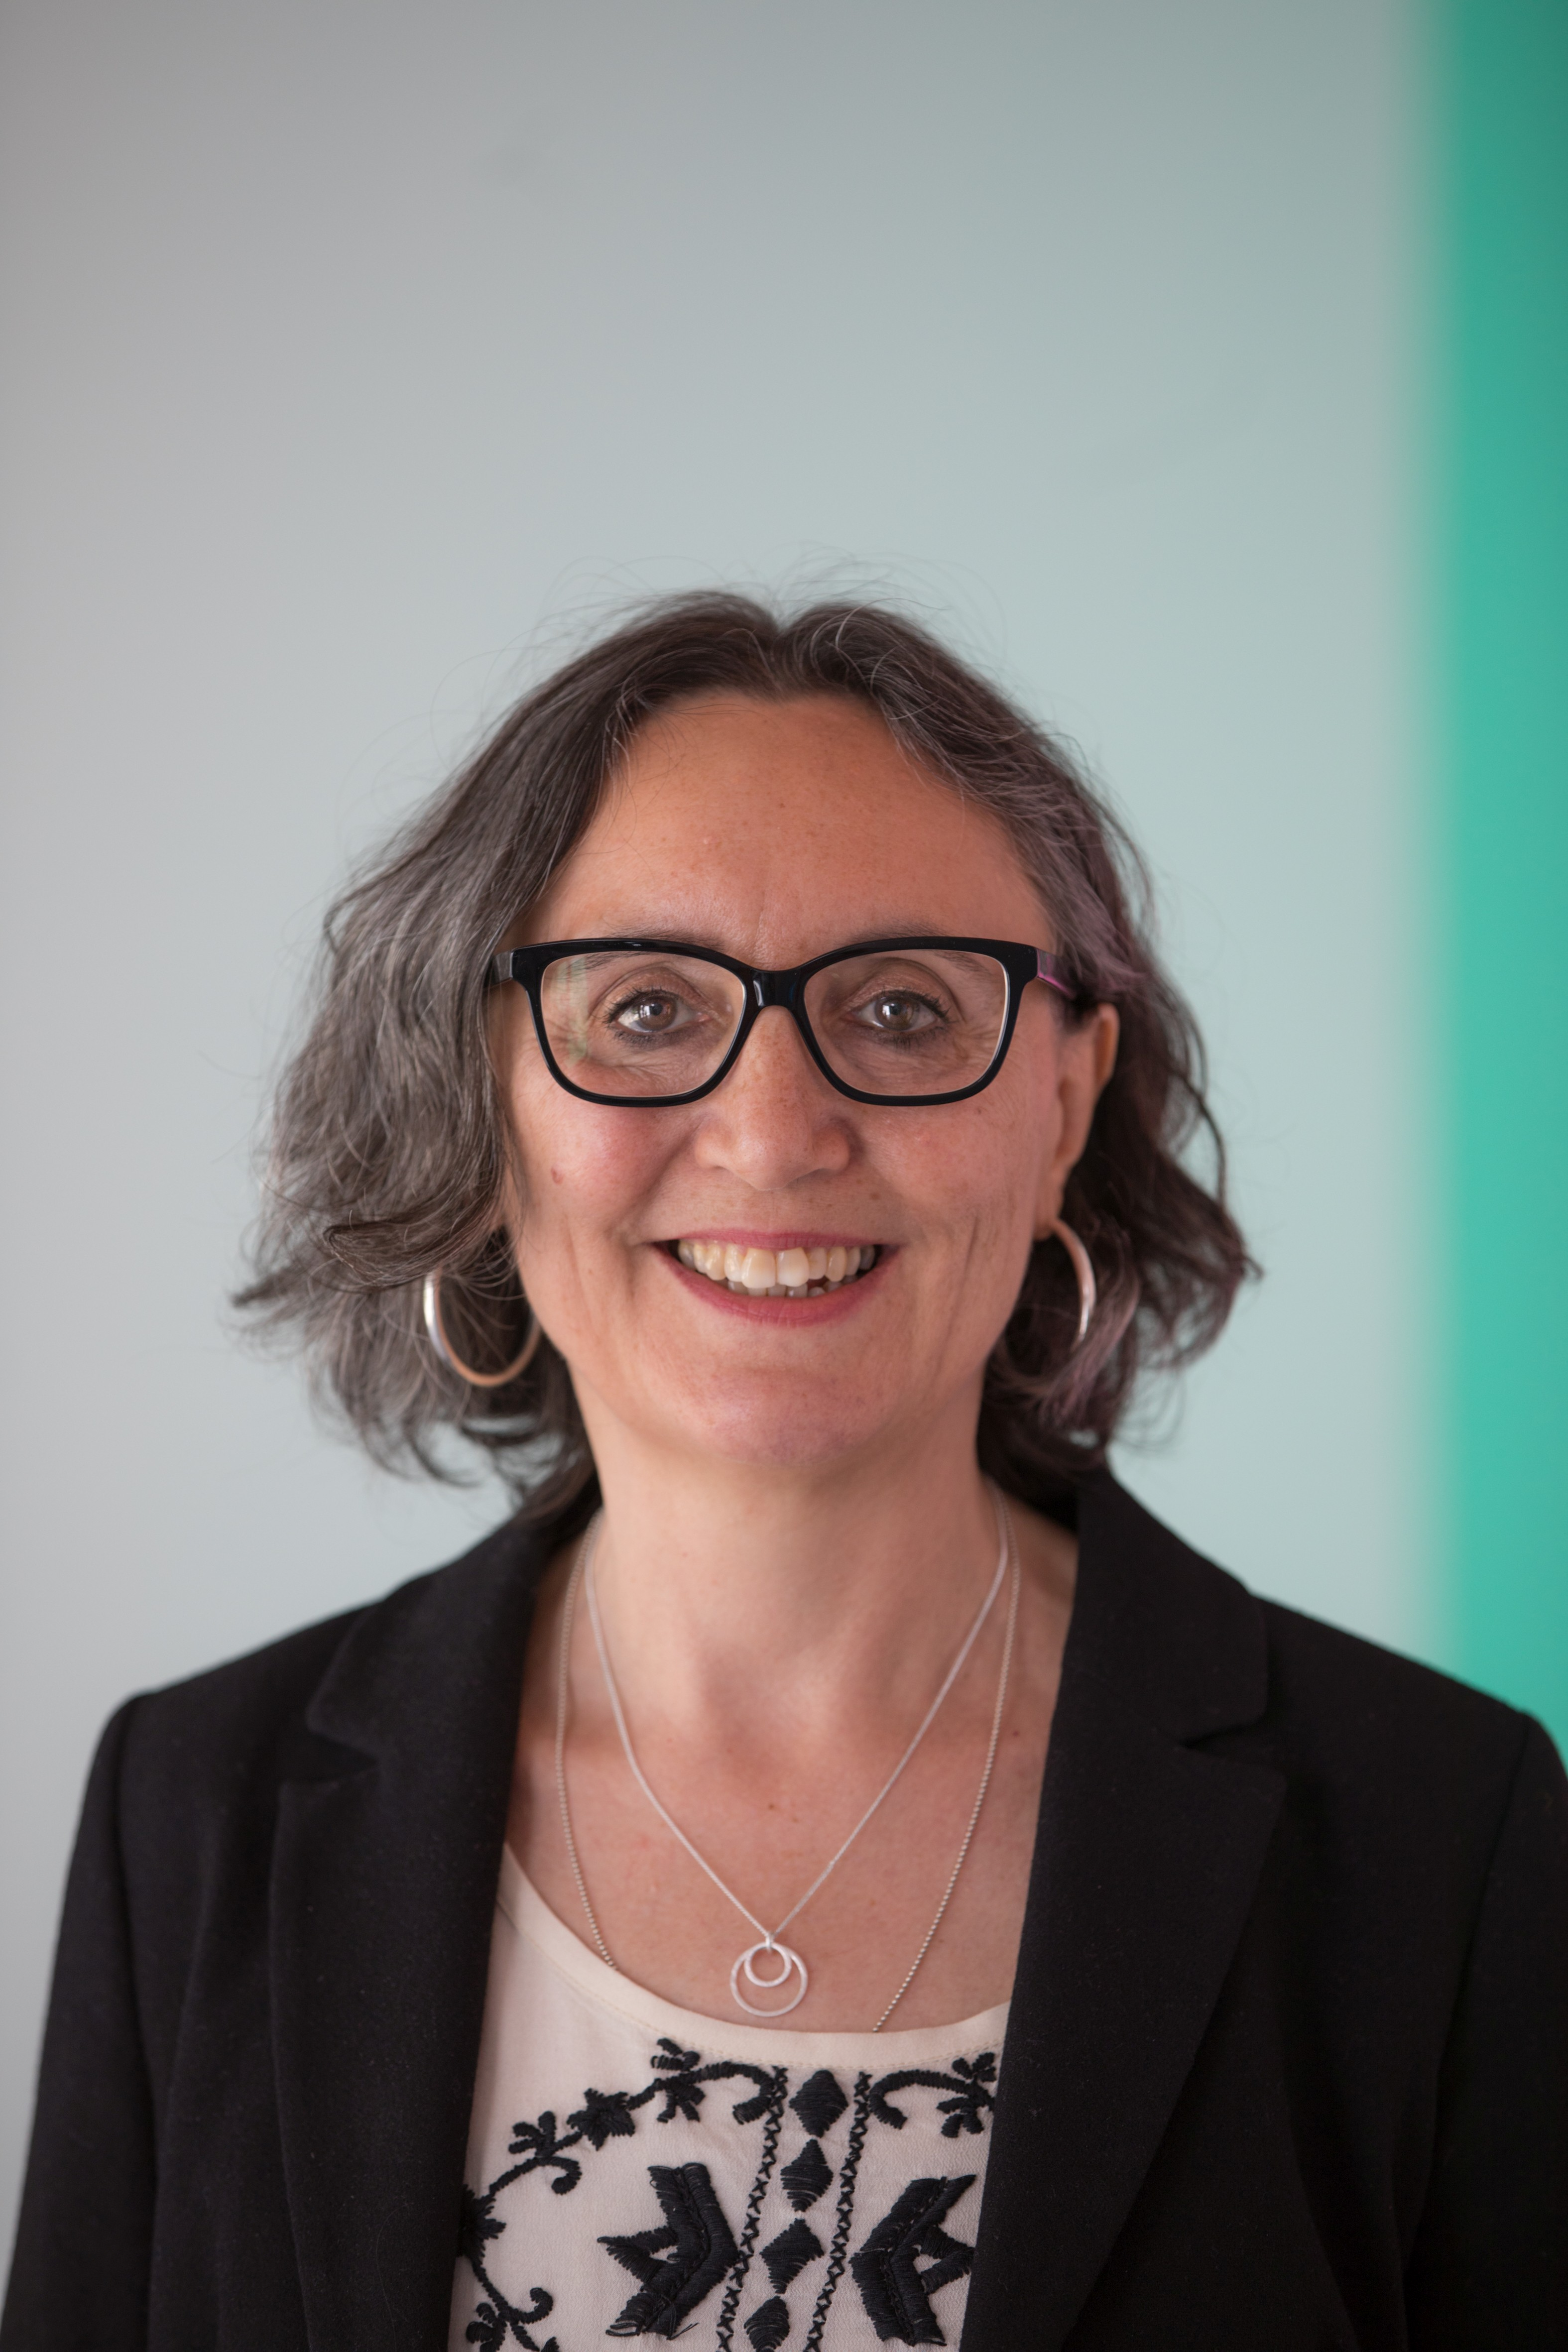 Karin Lippert